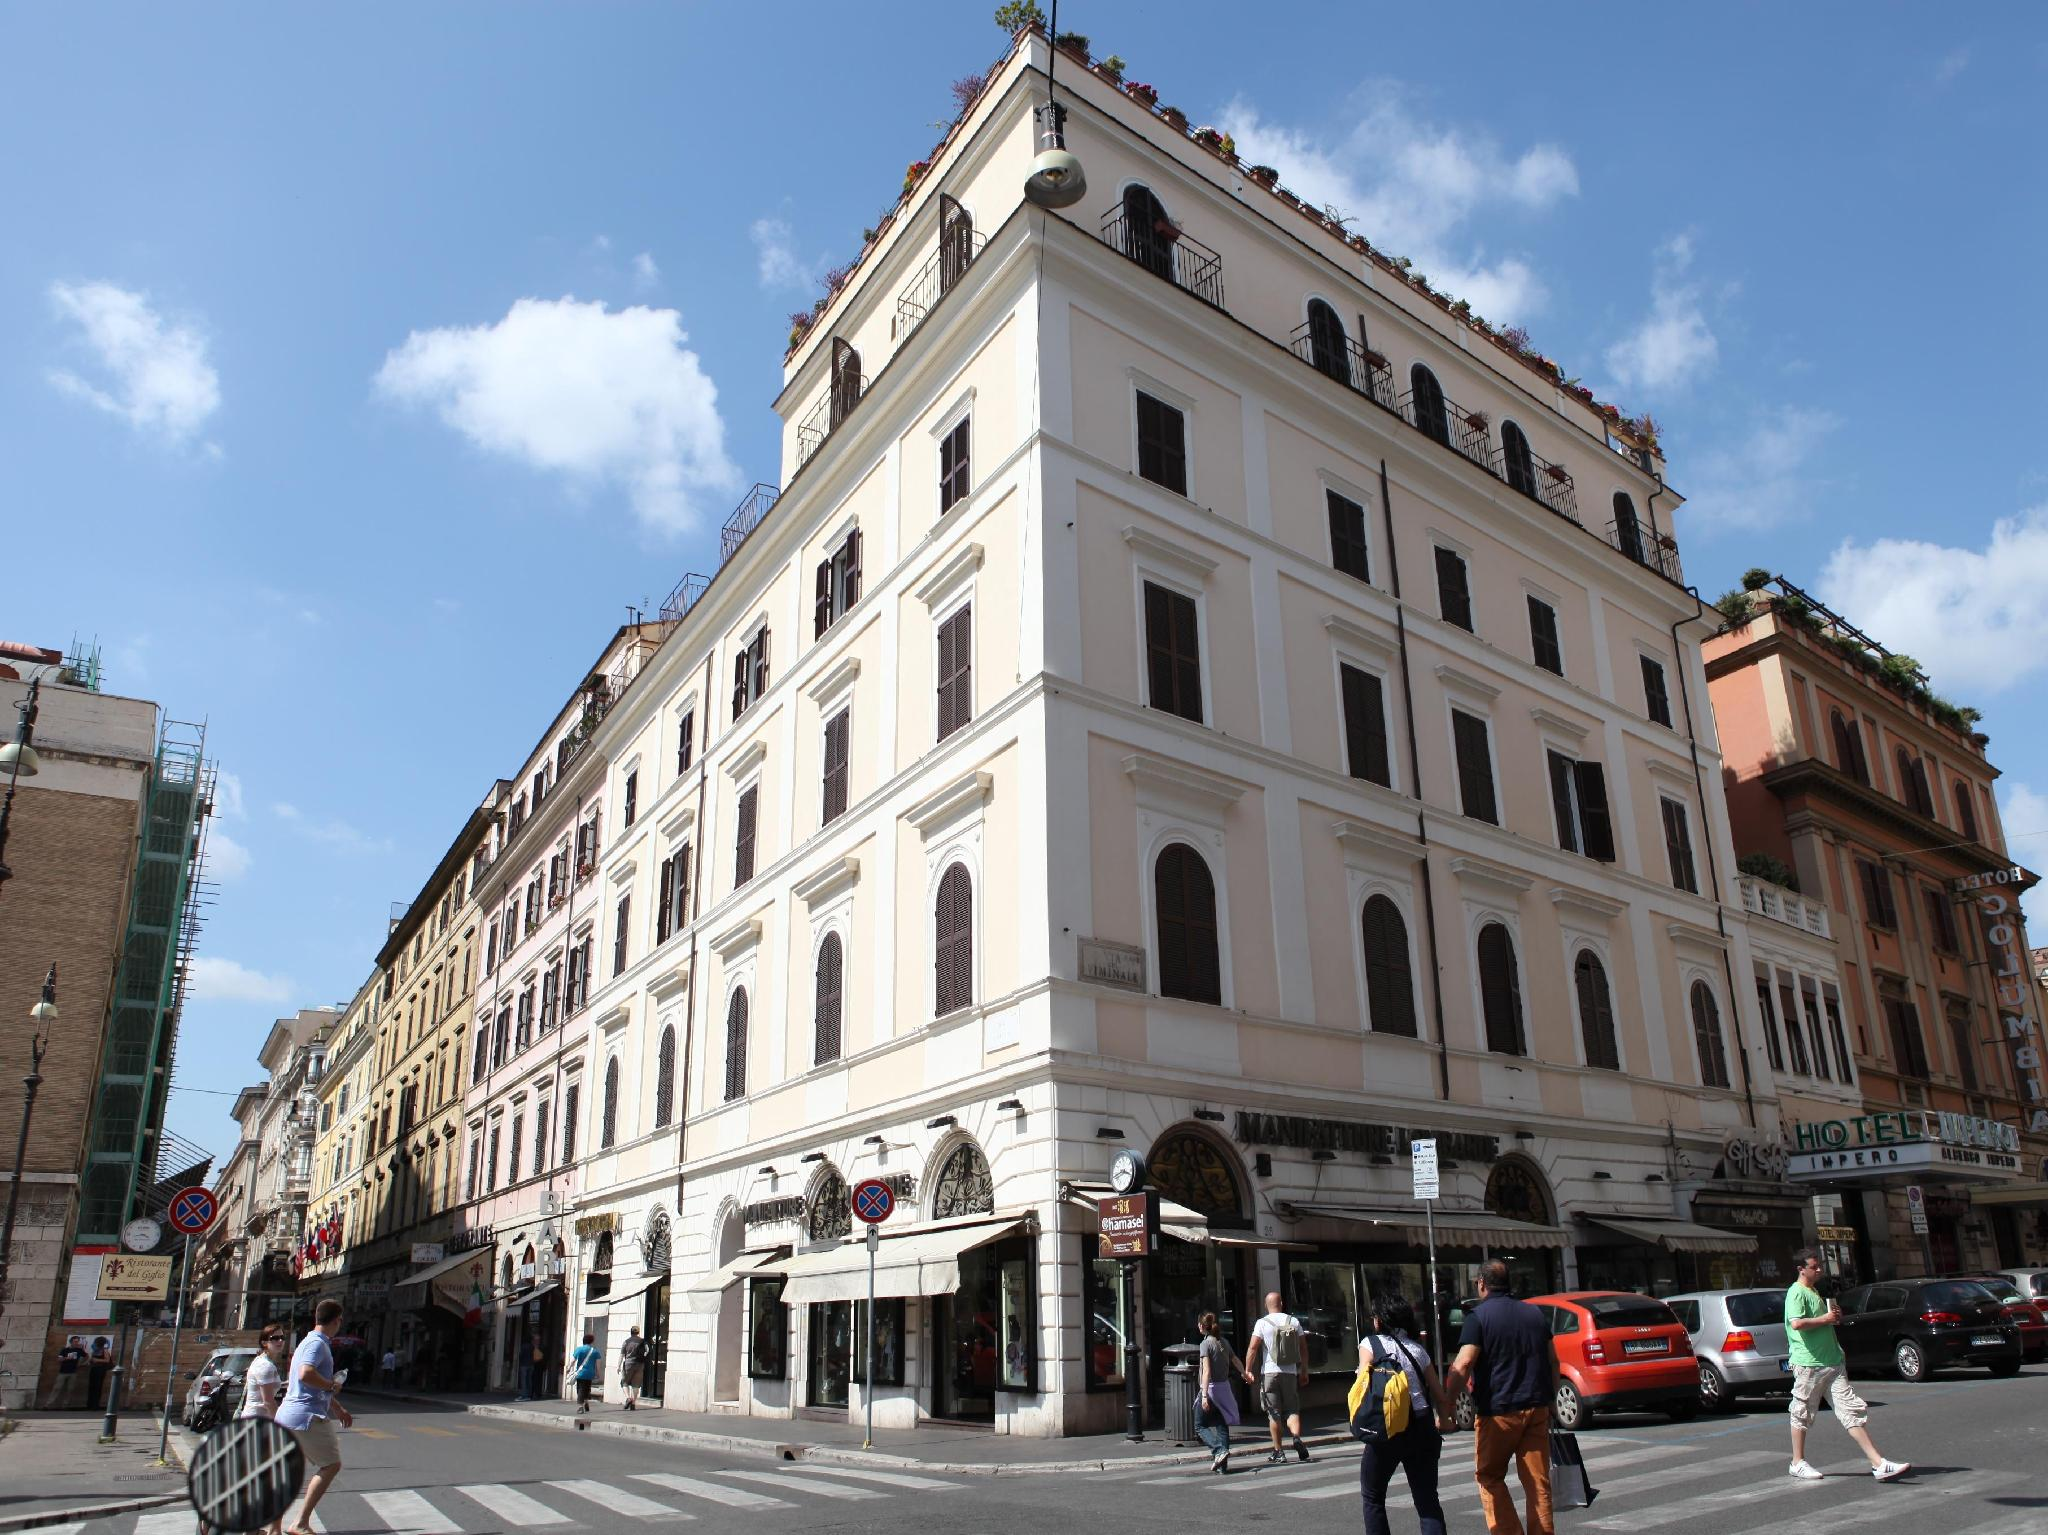 Impero Hotel - Termini Central Station, Rome, Italy ...